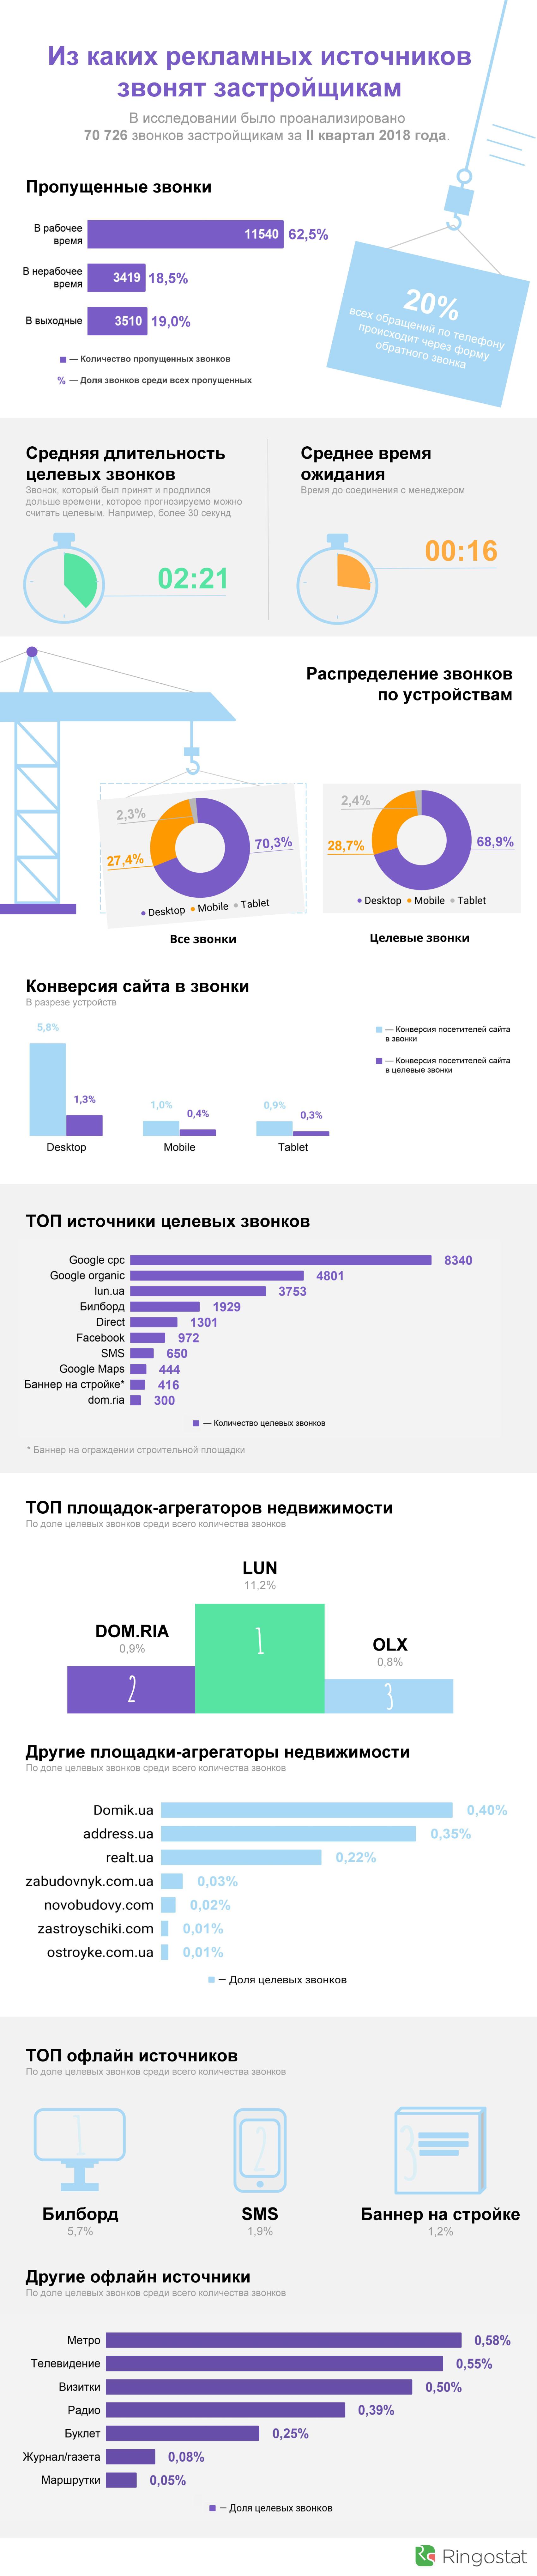 Украинские застройщики звонки за 2 квартал 2018